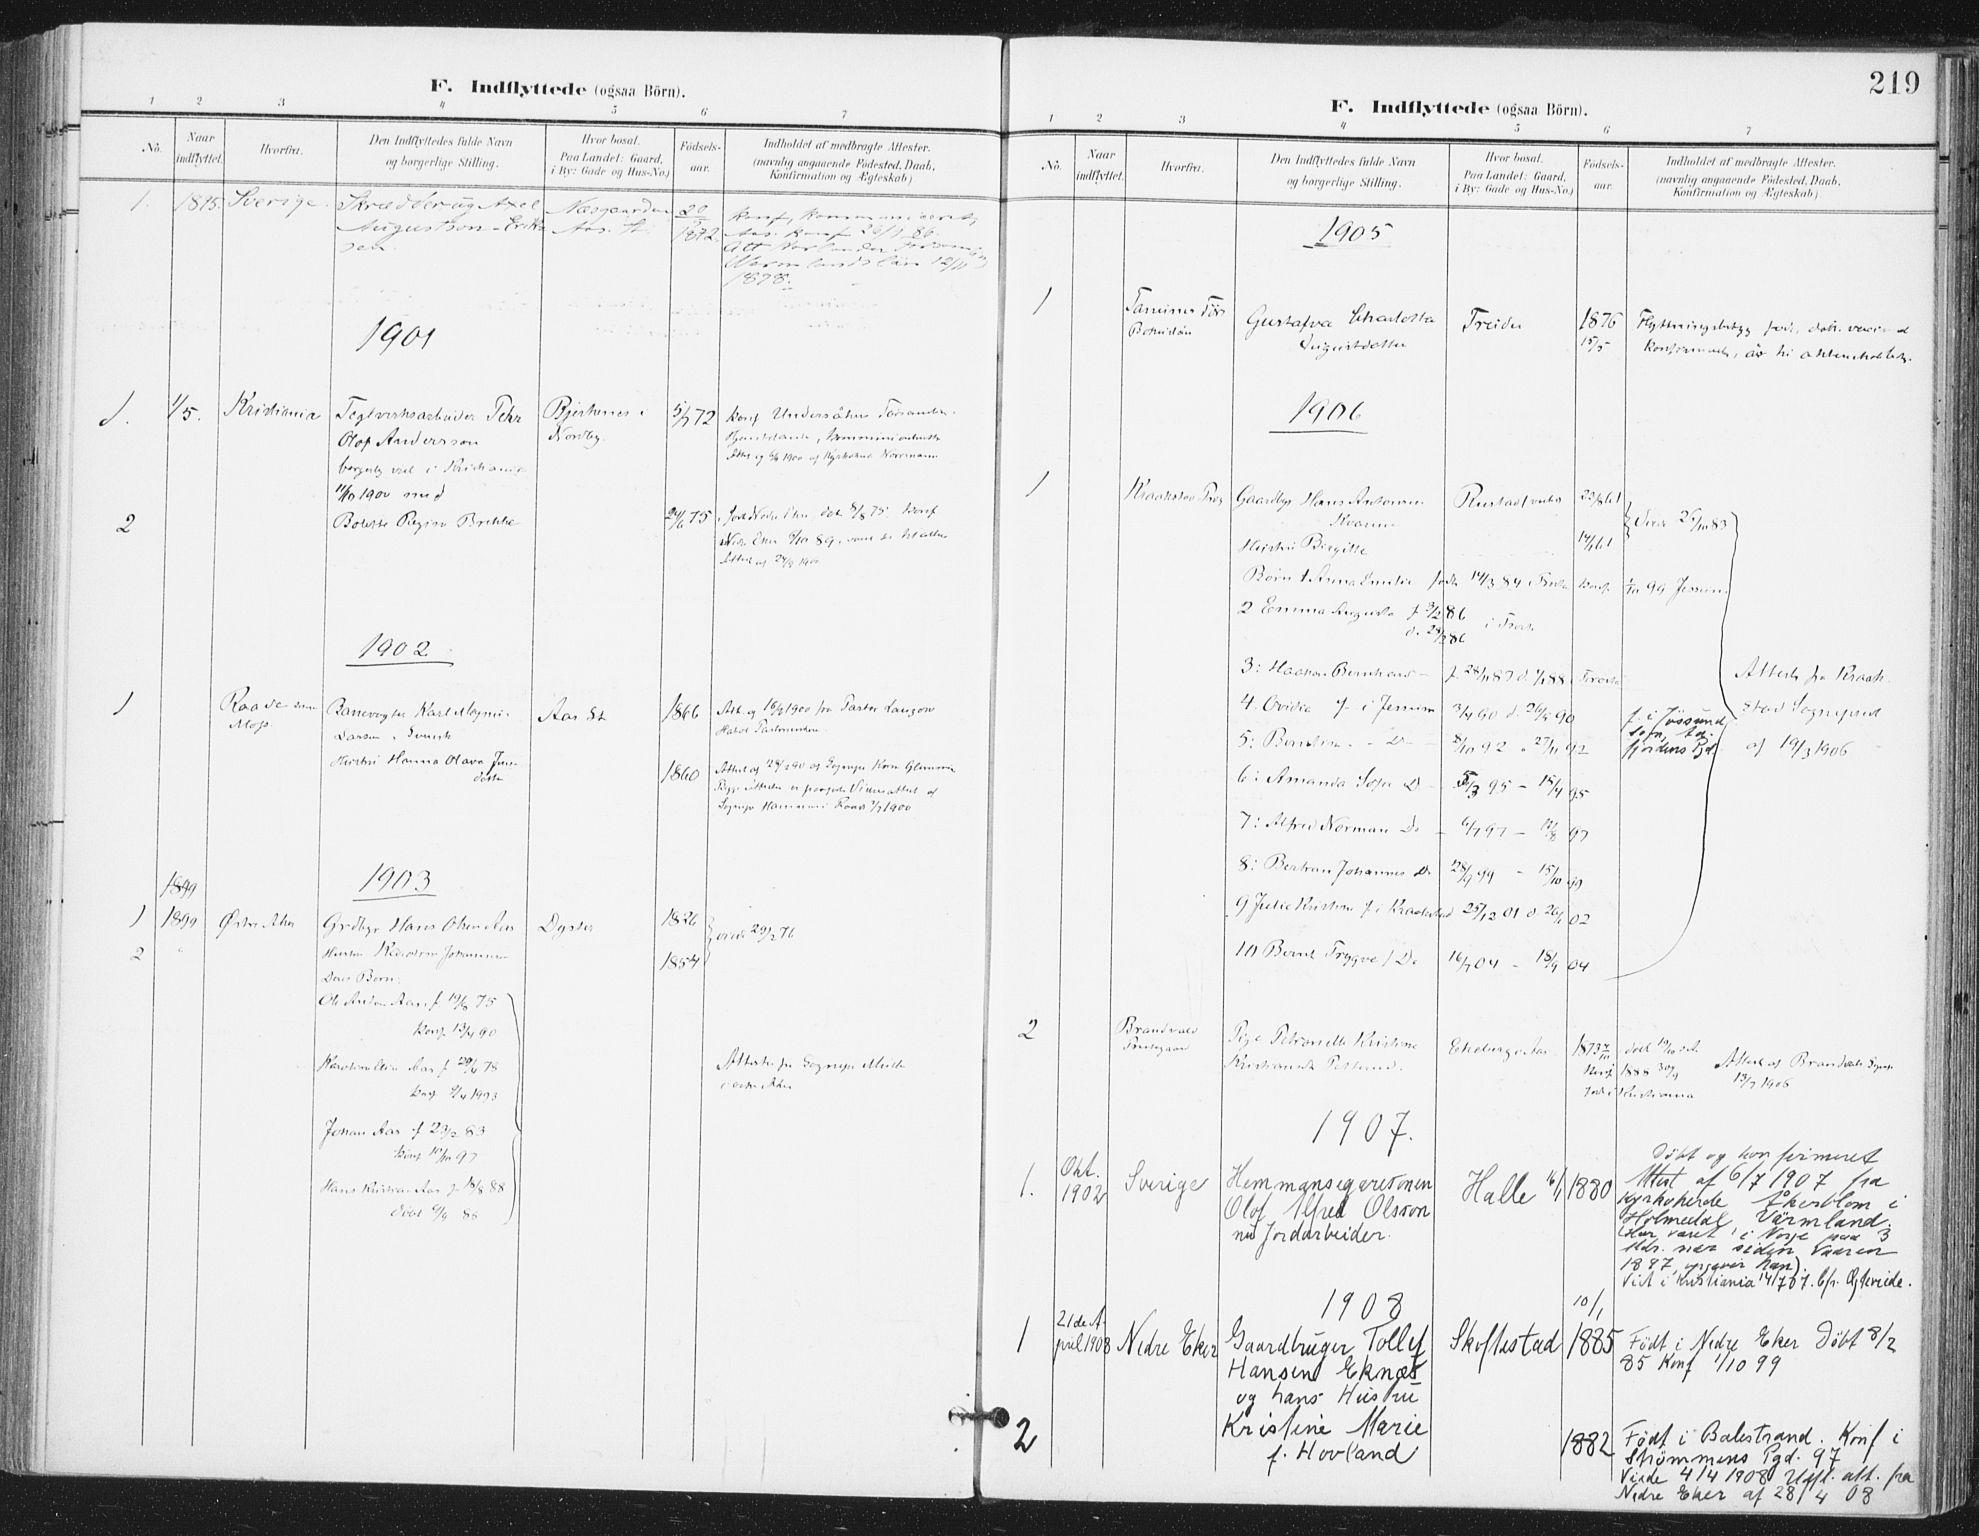 SAO, Ås prestekontor Kirkebøker, F/Fa/L0010: Ministerialbok nr. I 10, 1900-1918, s. 219